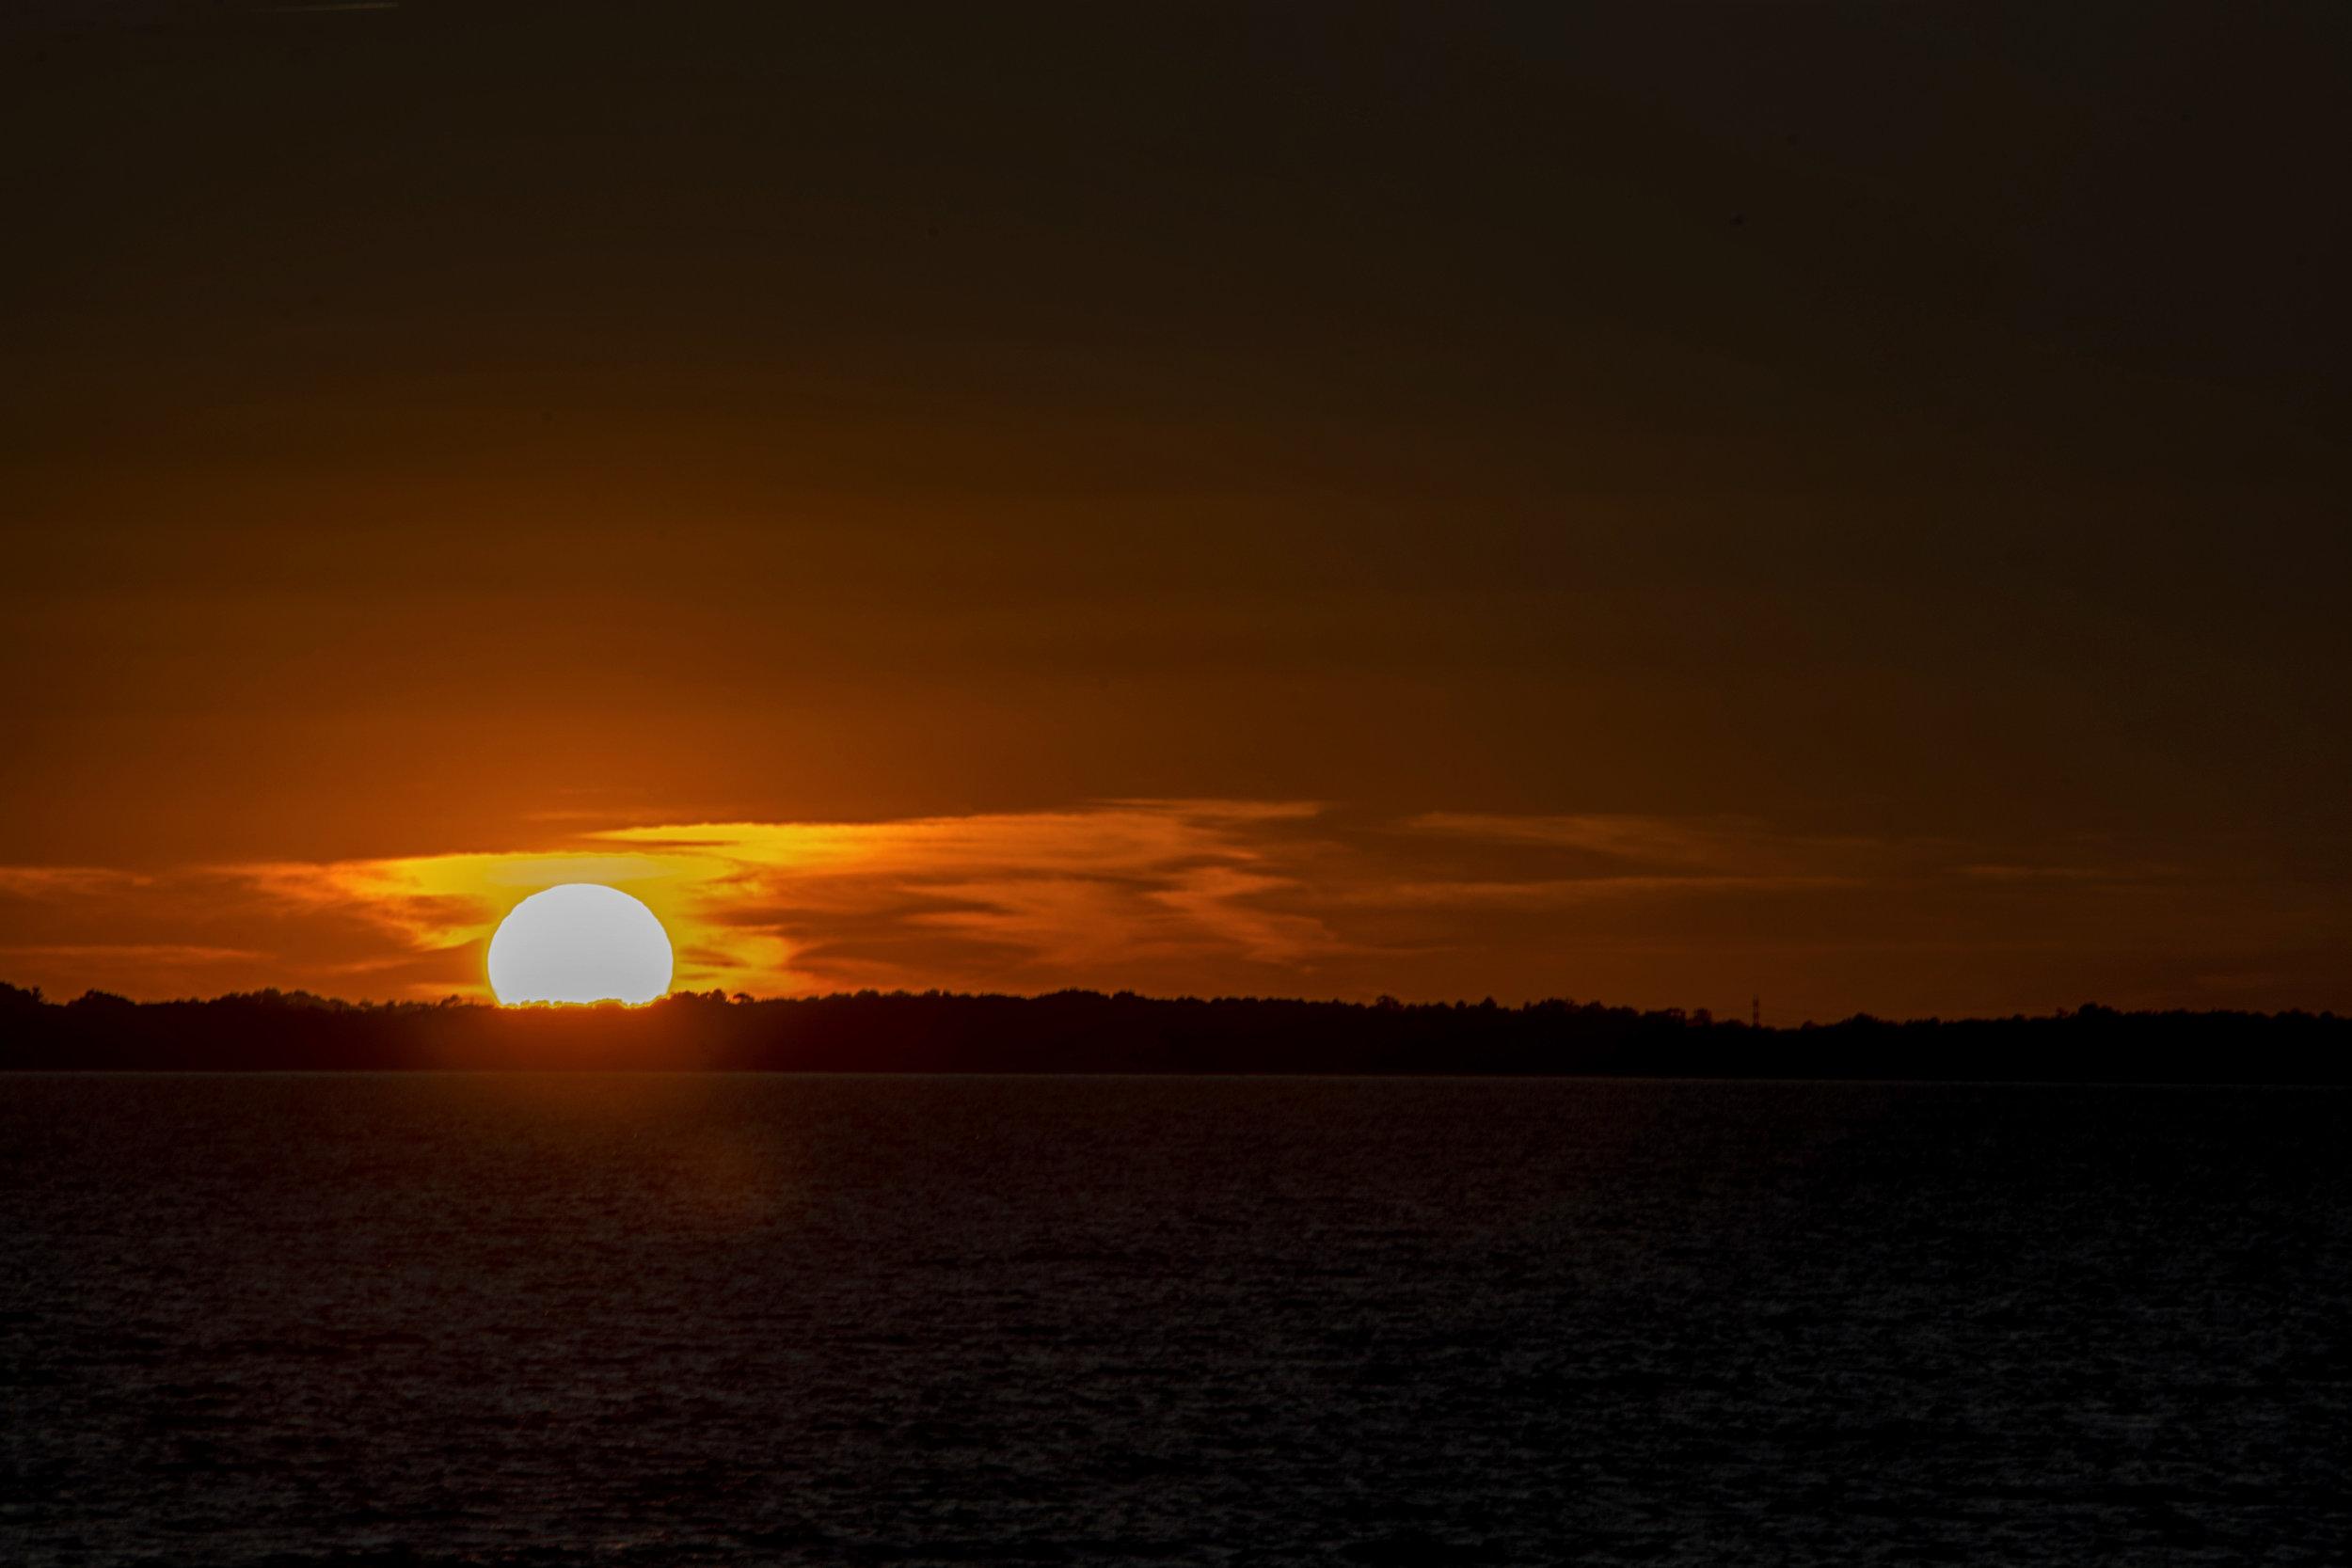 sunset, OBX